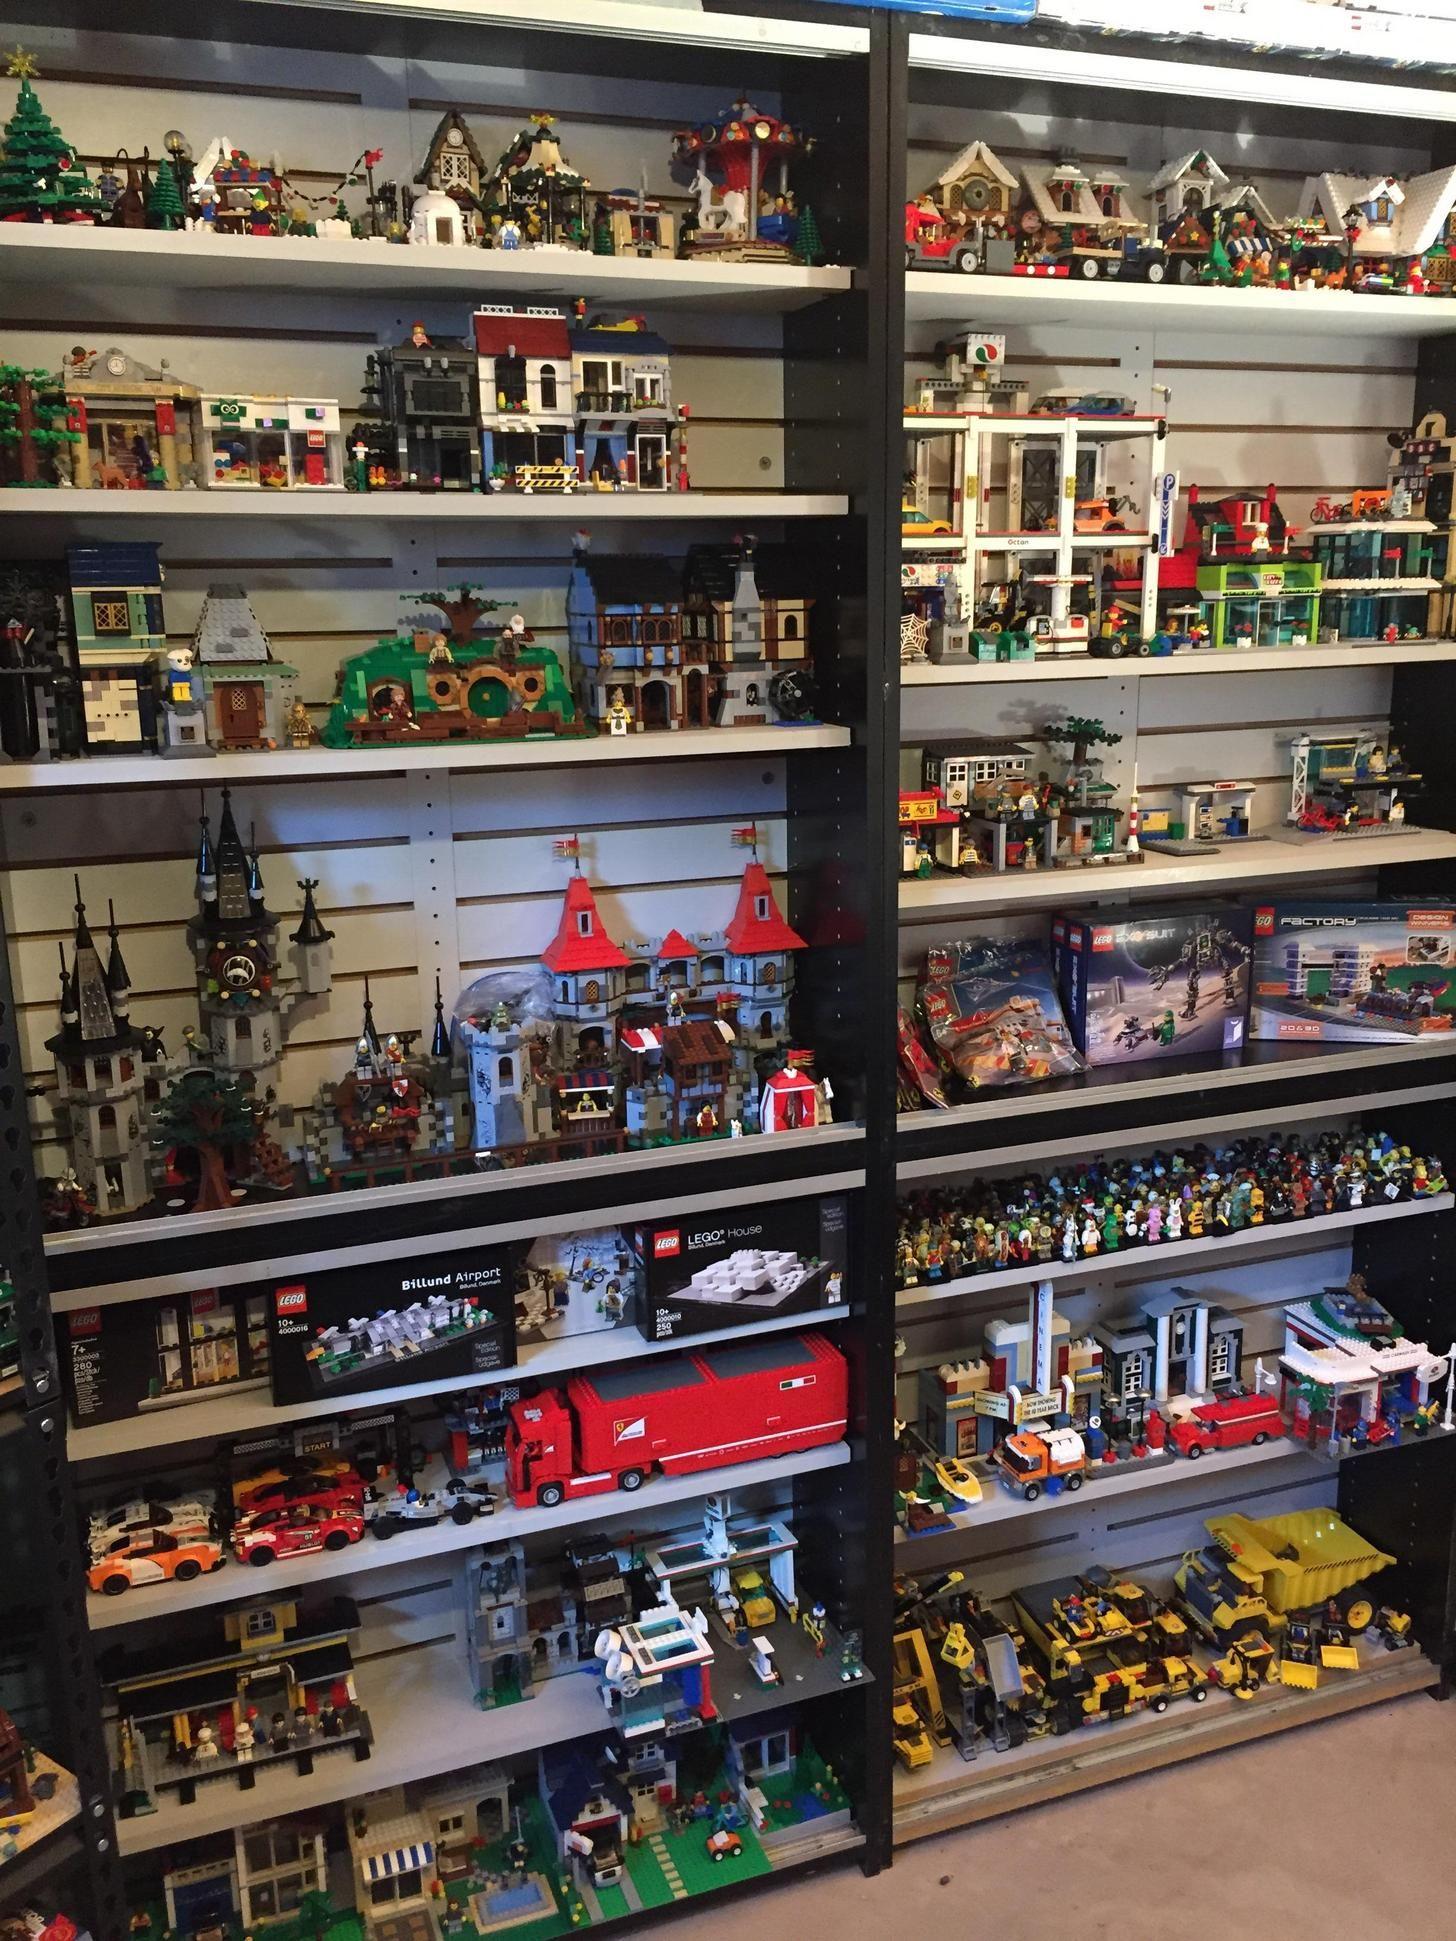 My Lego Collection Lego Room Lego Display Lego Room Decor